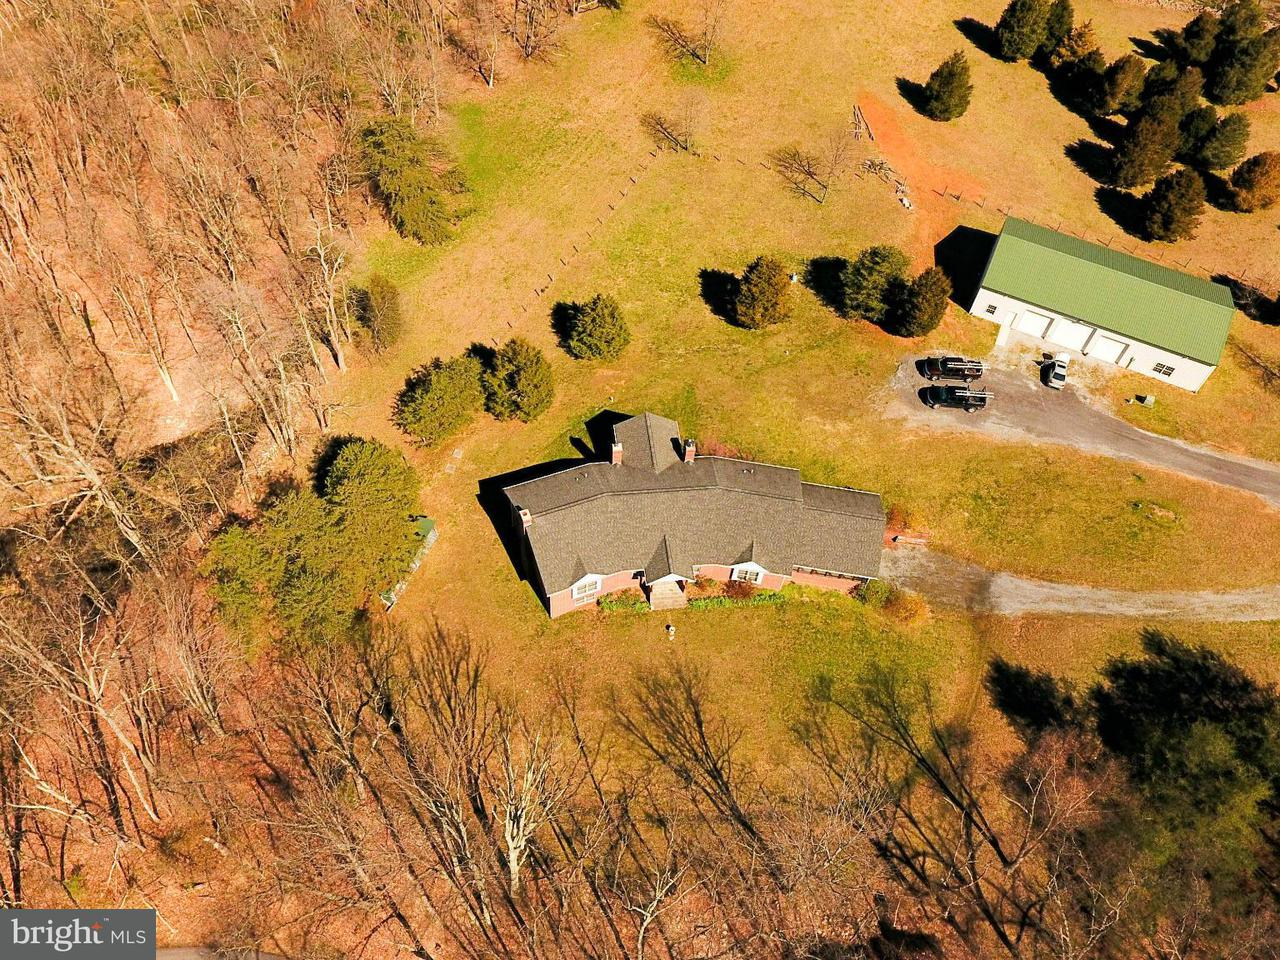 Casa Unifamiliar por un Venta en 12536 Mummert Road 12536 Mummert Road Clear Spring, Maryland 21722 Estados Unidos